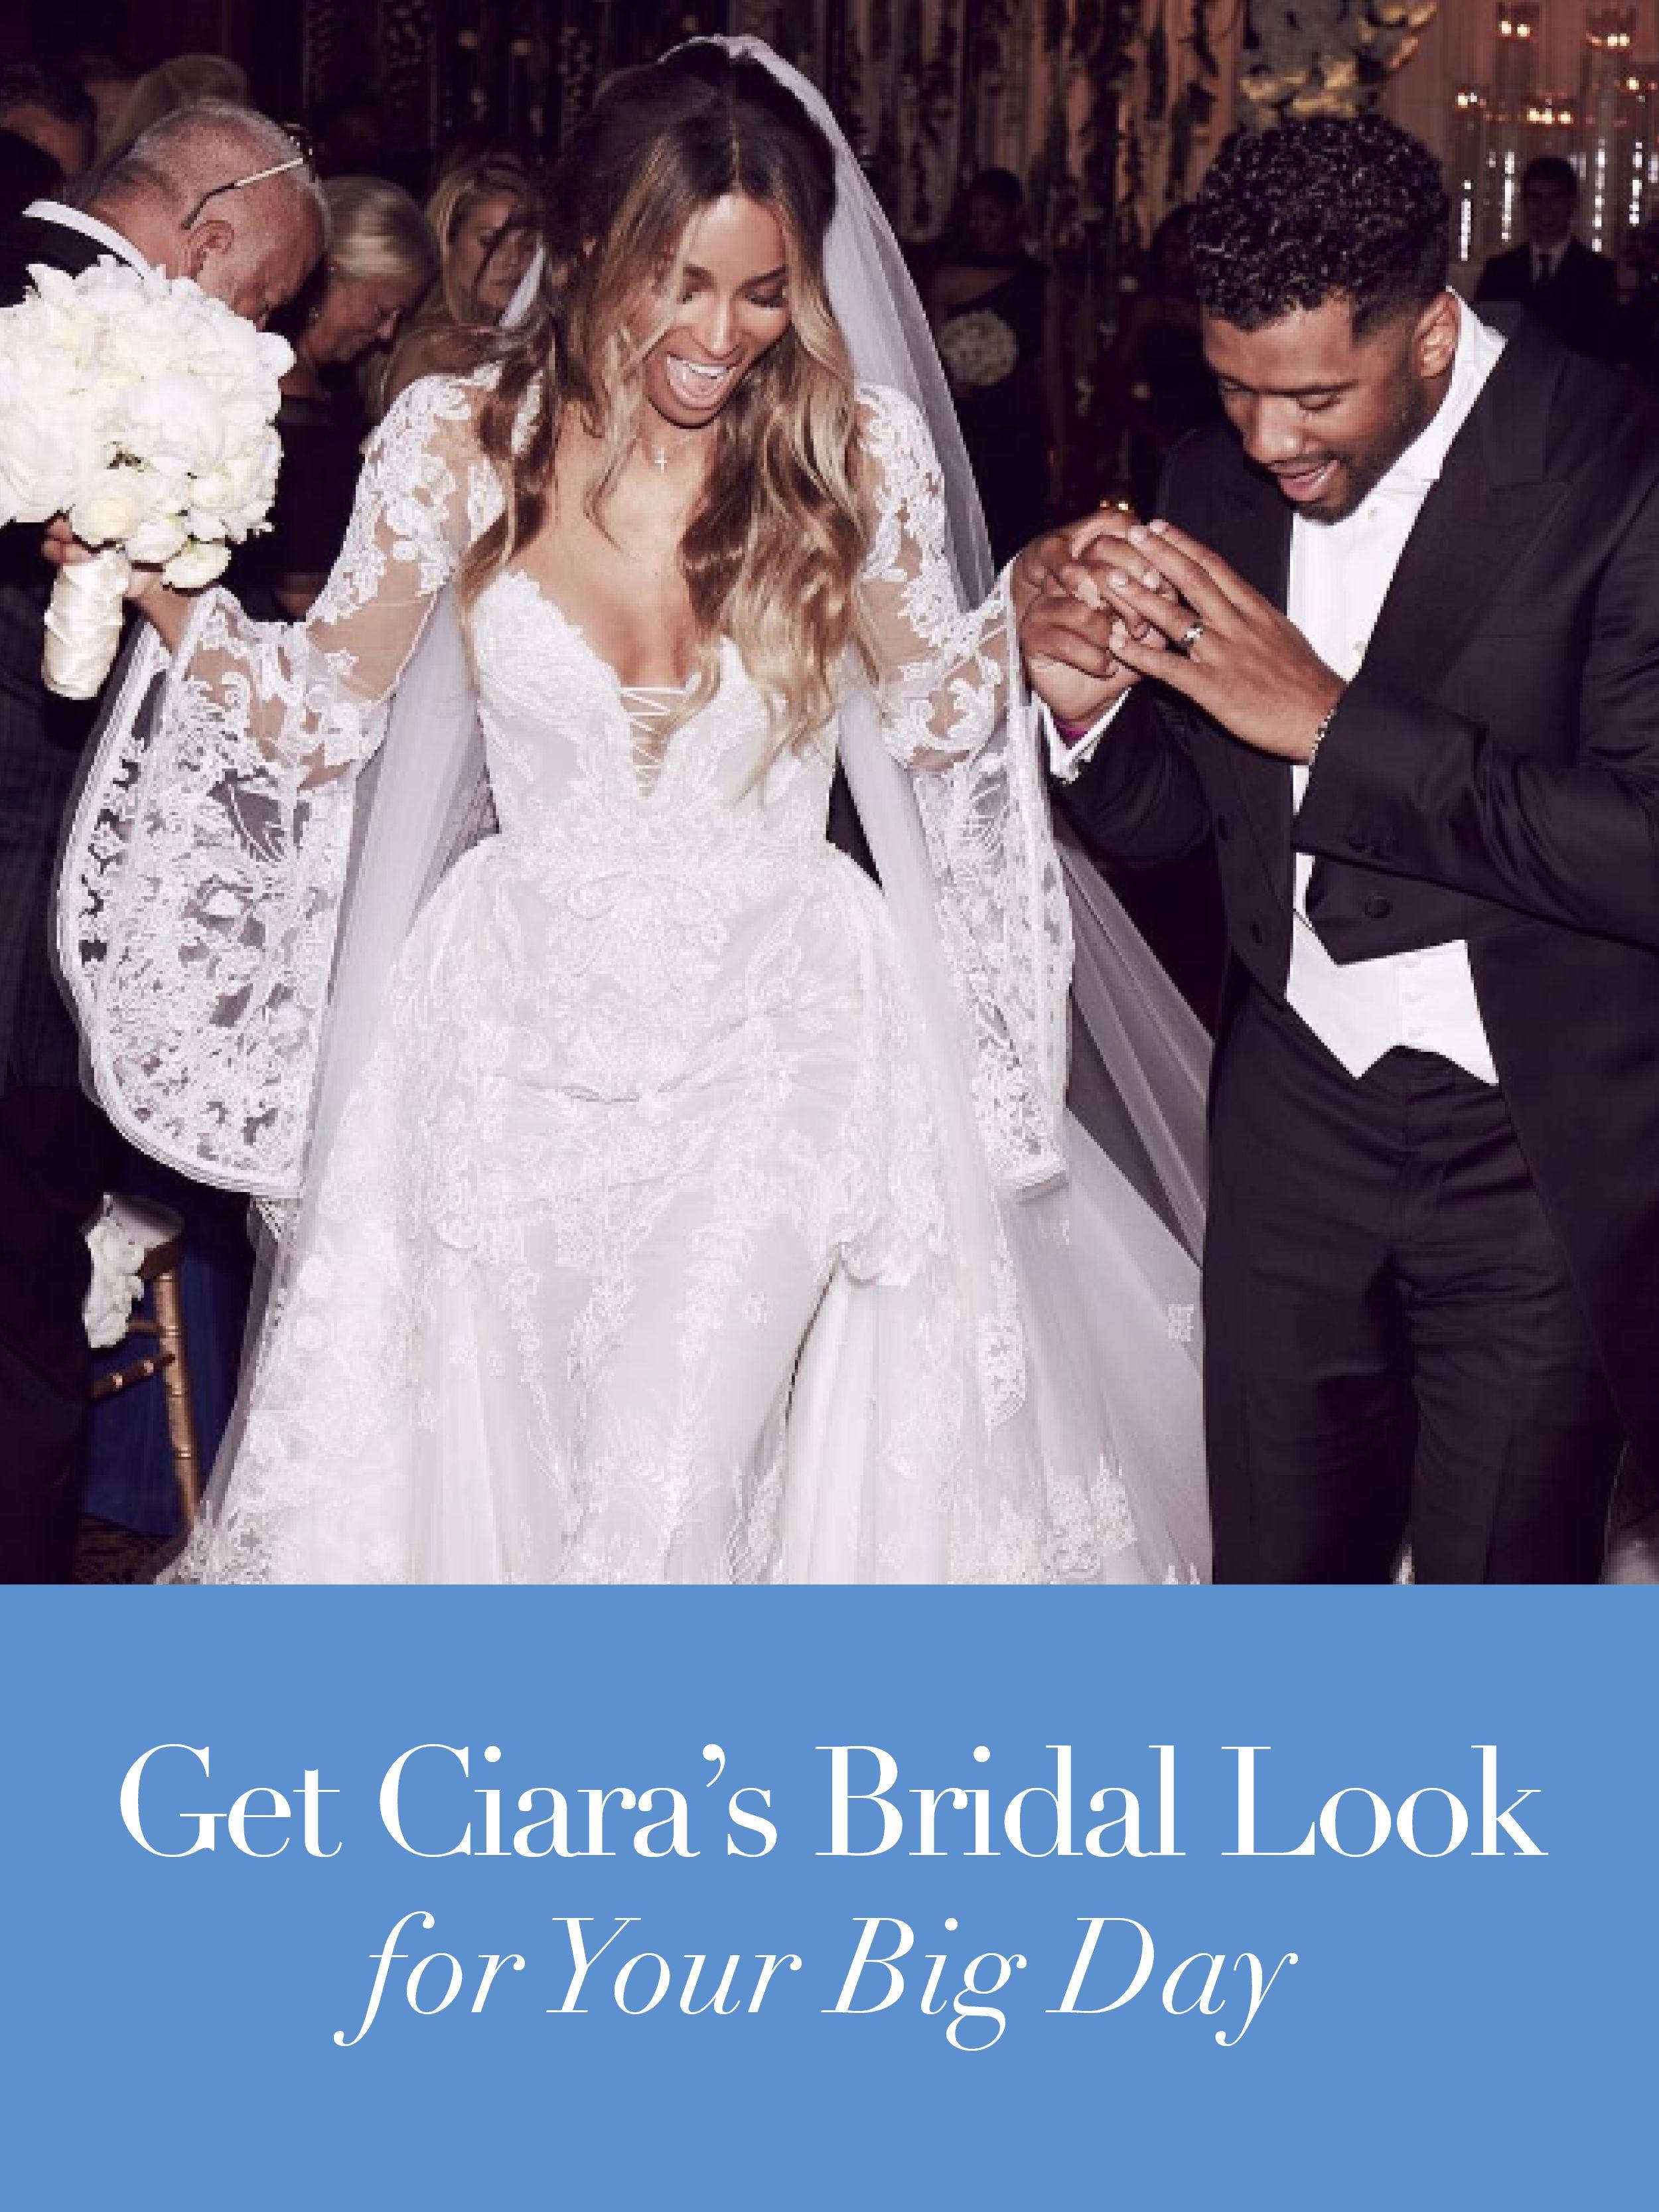 Ciara Russell Wilson 13 Wedding Dresses Inspired By Her Gown Wedding Dresses Celebrity Weddings Designer Wedding Dresses